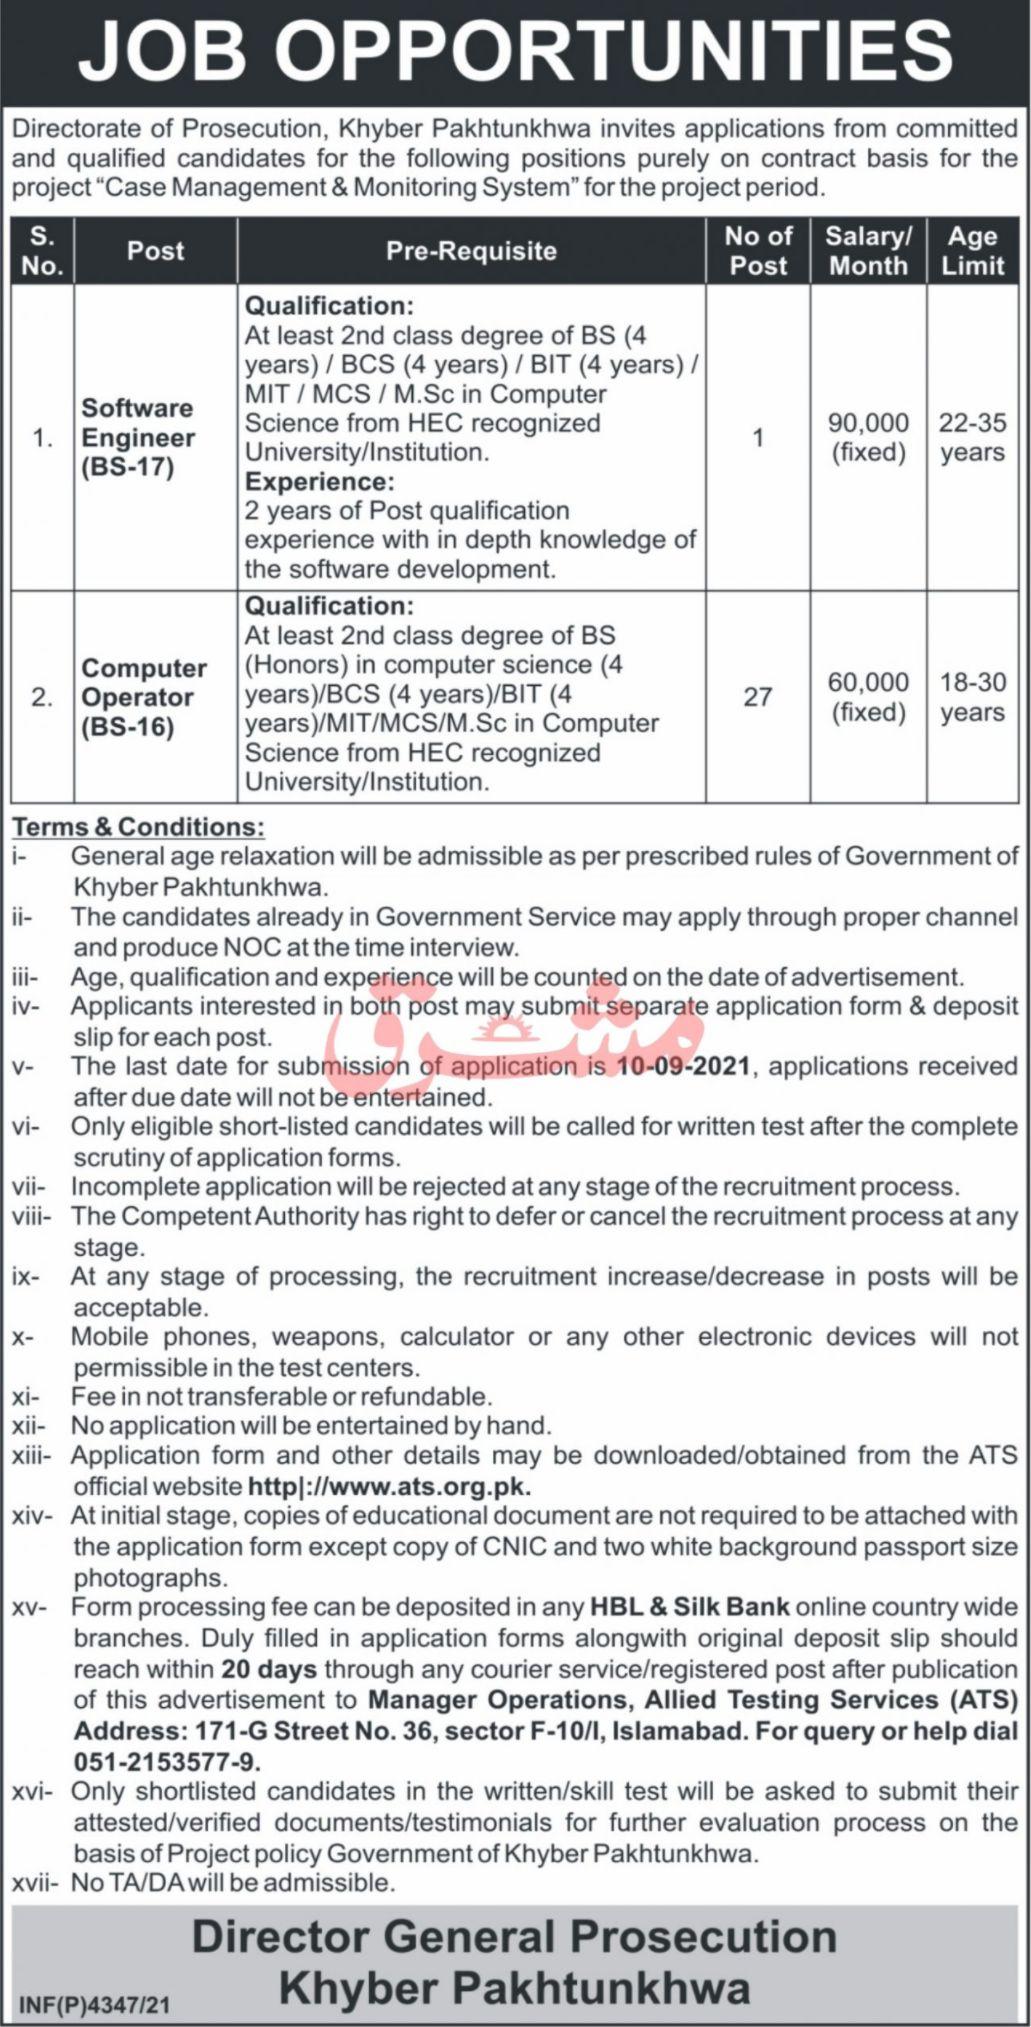 Directorate of Prosecution Khyber Pakhtunkhwa Vacancies 2021 2